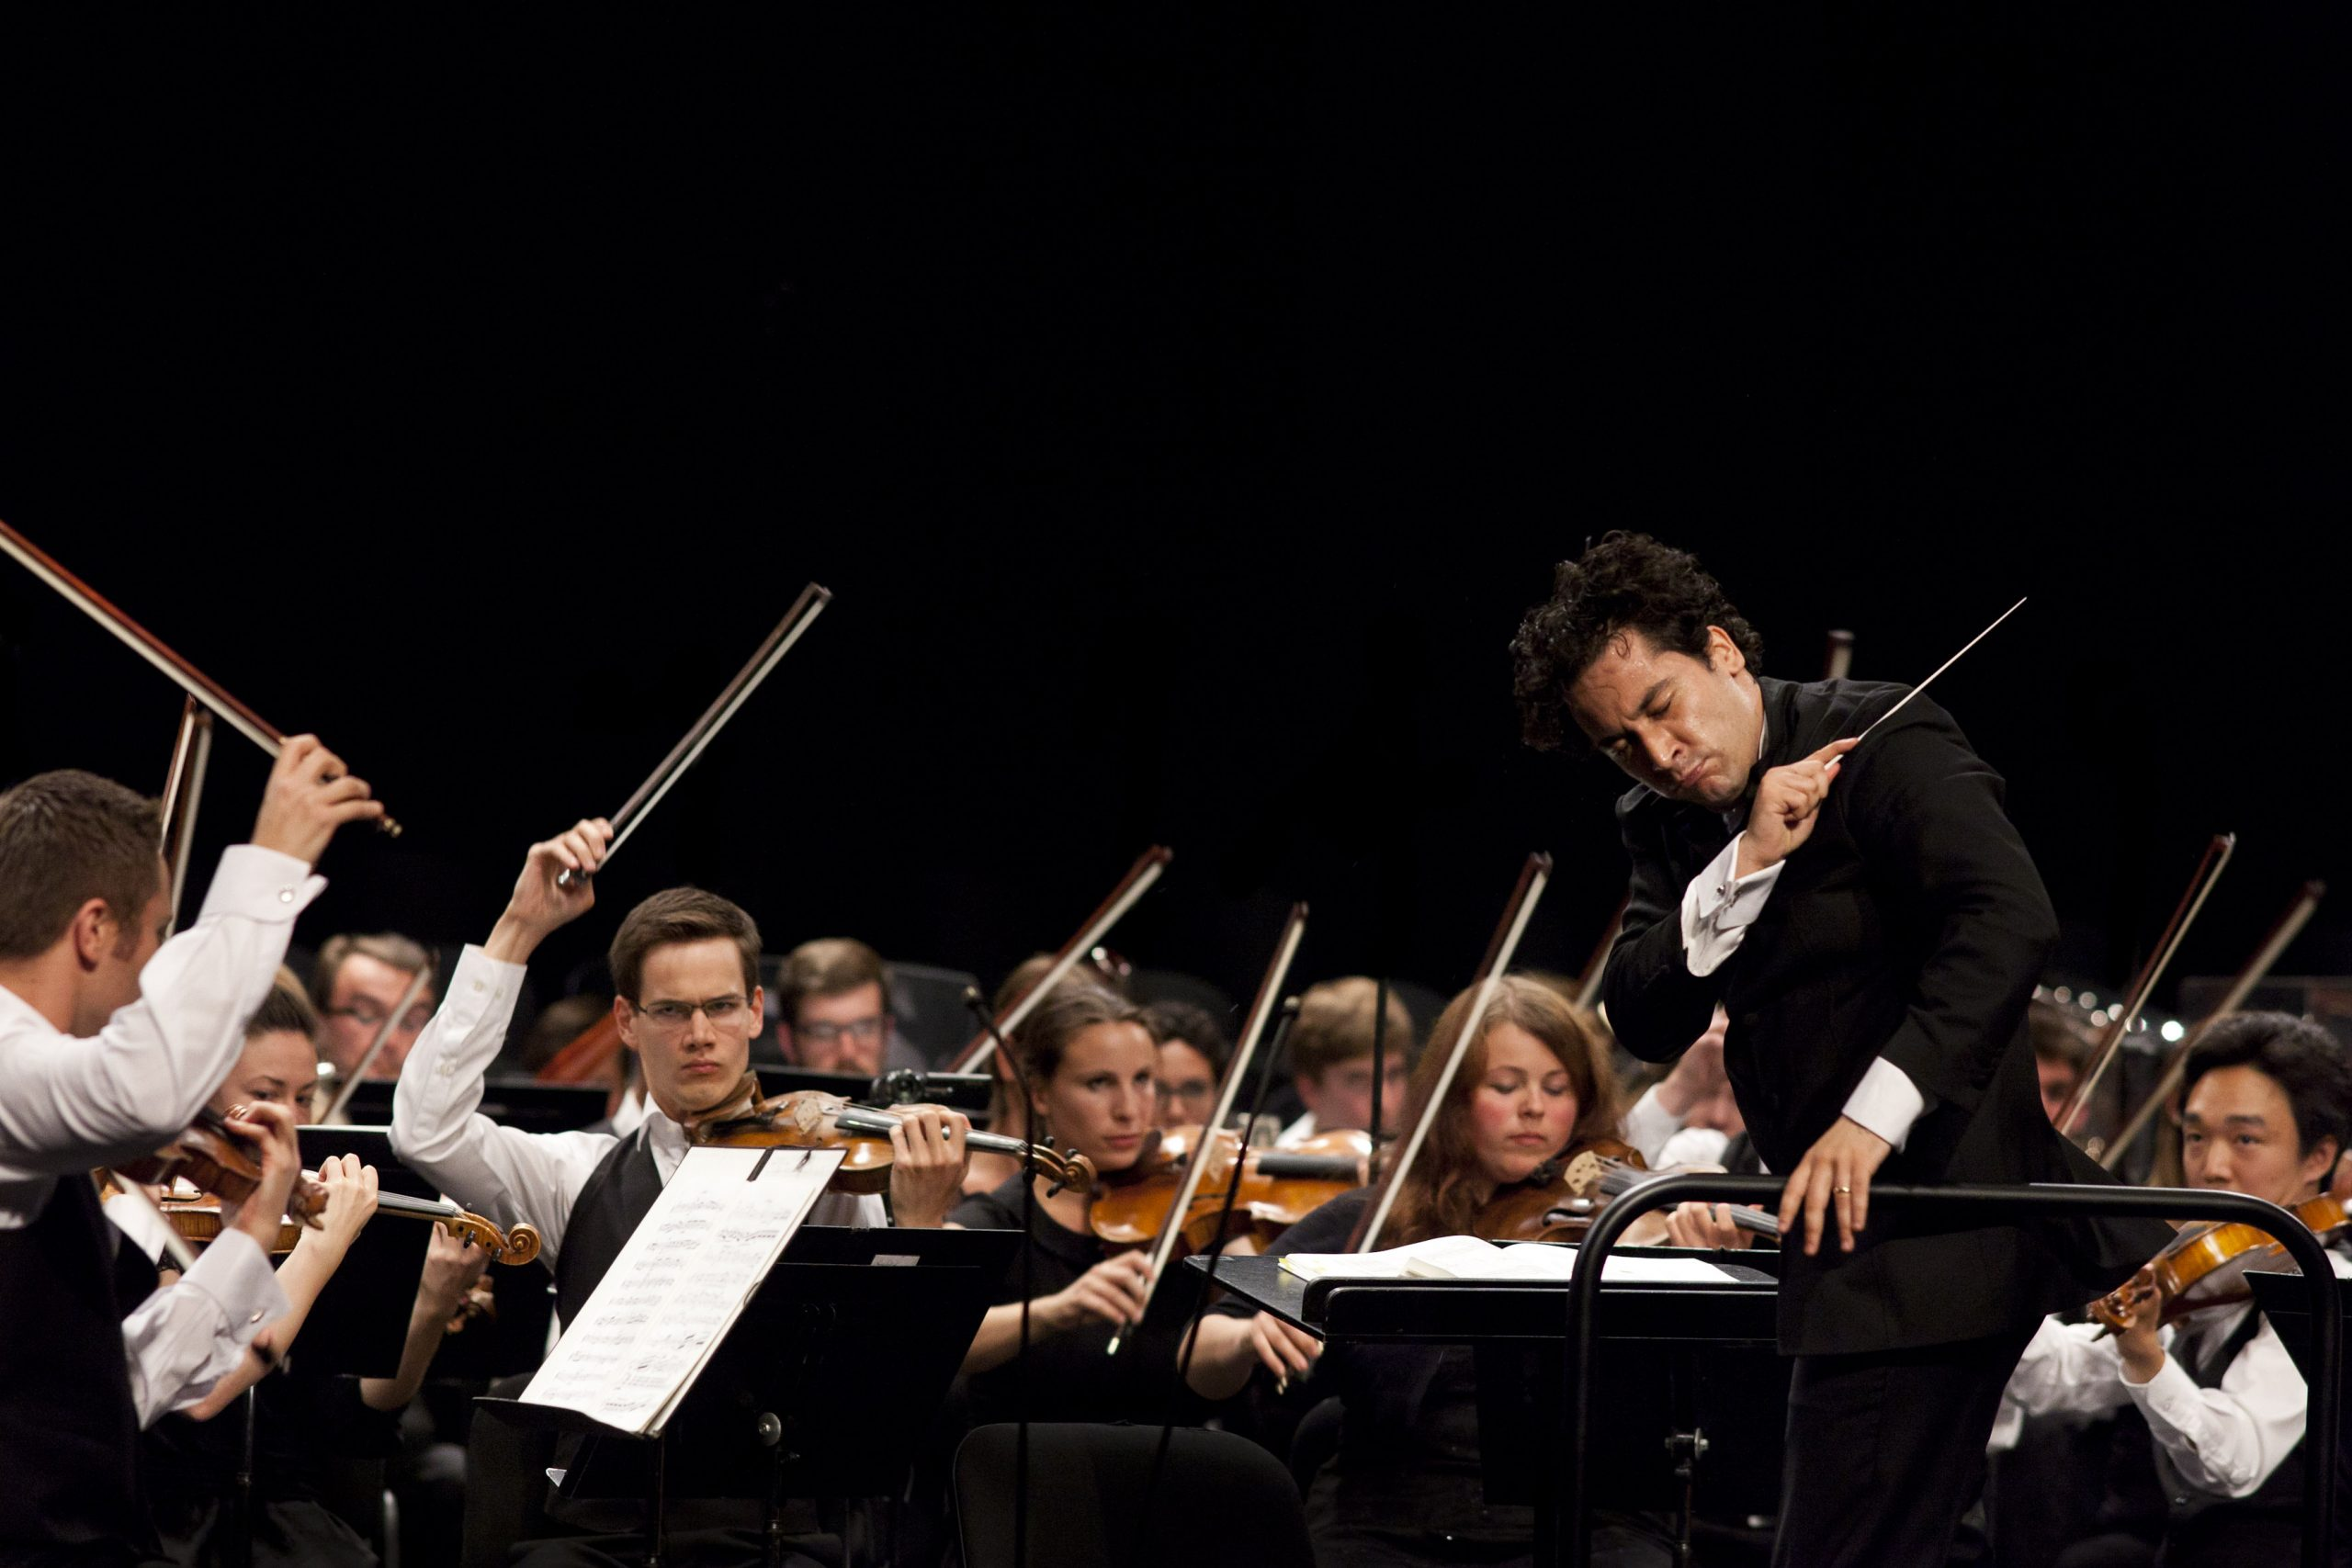 Andrés Orozco Estrade closing off the final dramatic crescendo of the Verbier Festival Orchestra